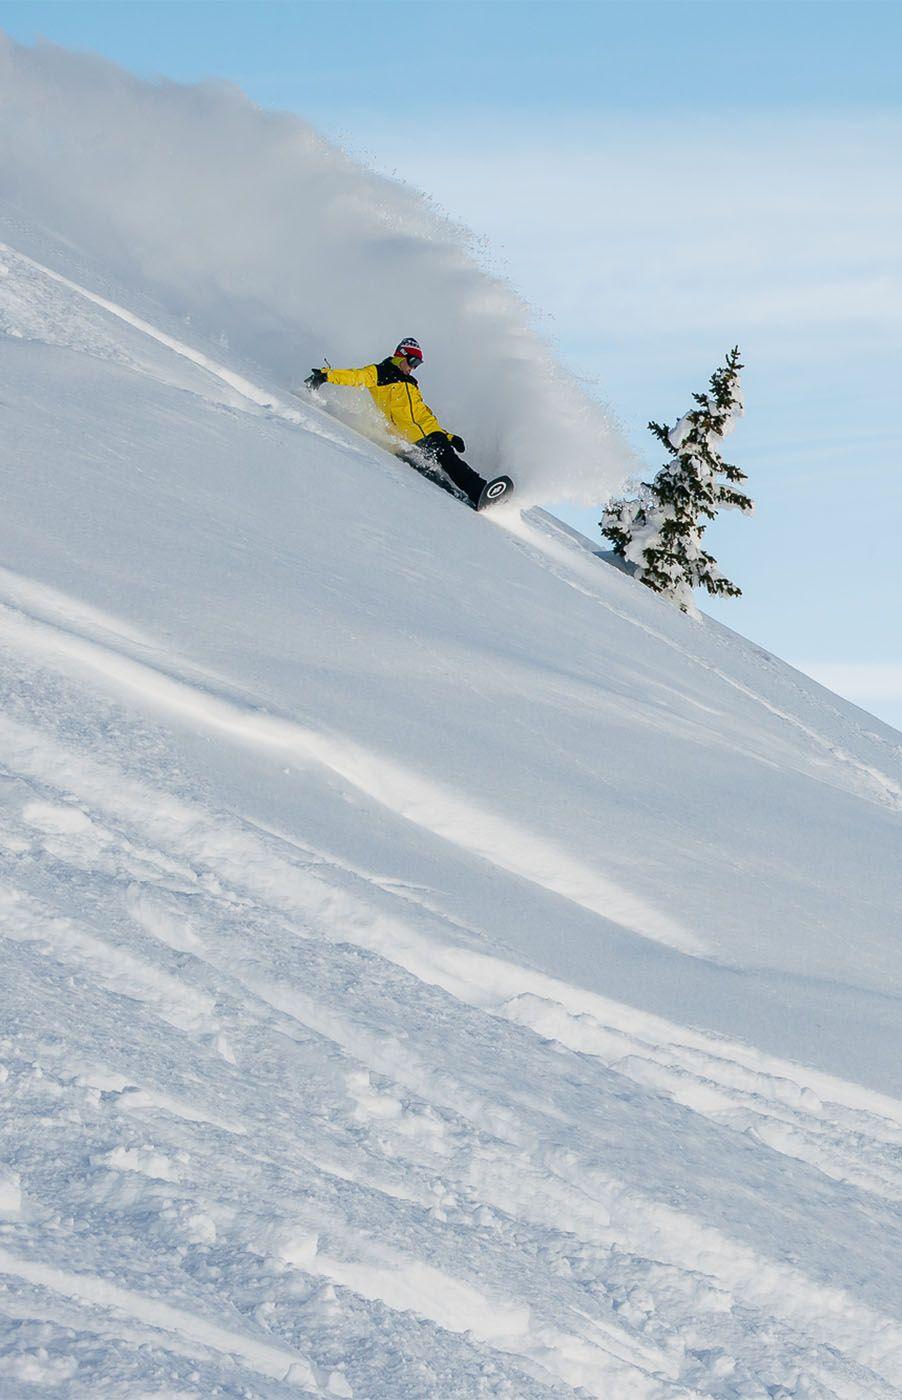 K2 Overboard Snowboarding, Outdoor, Waves